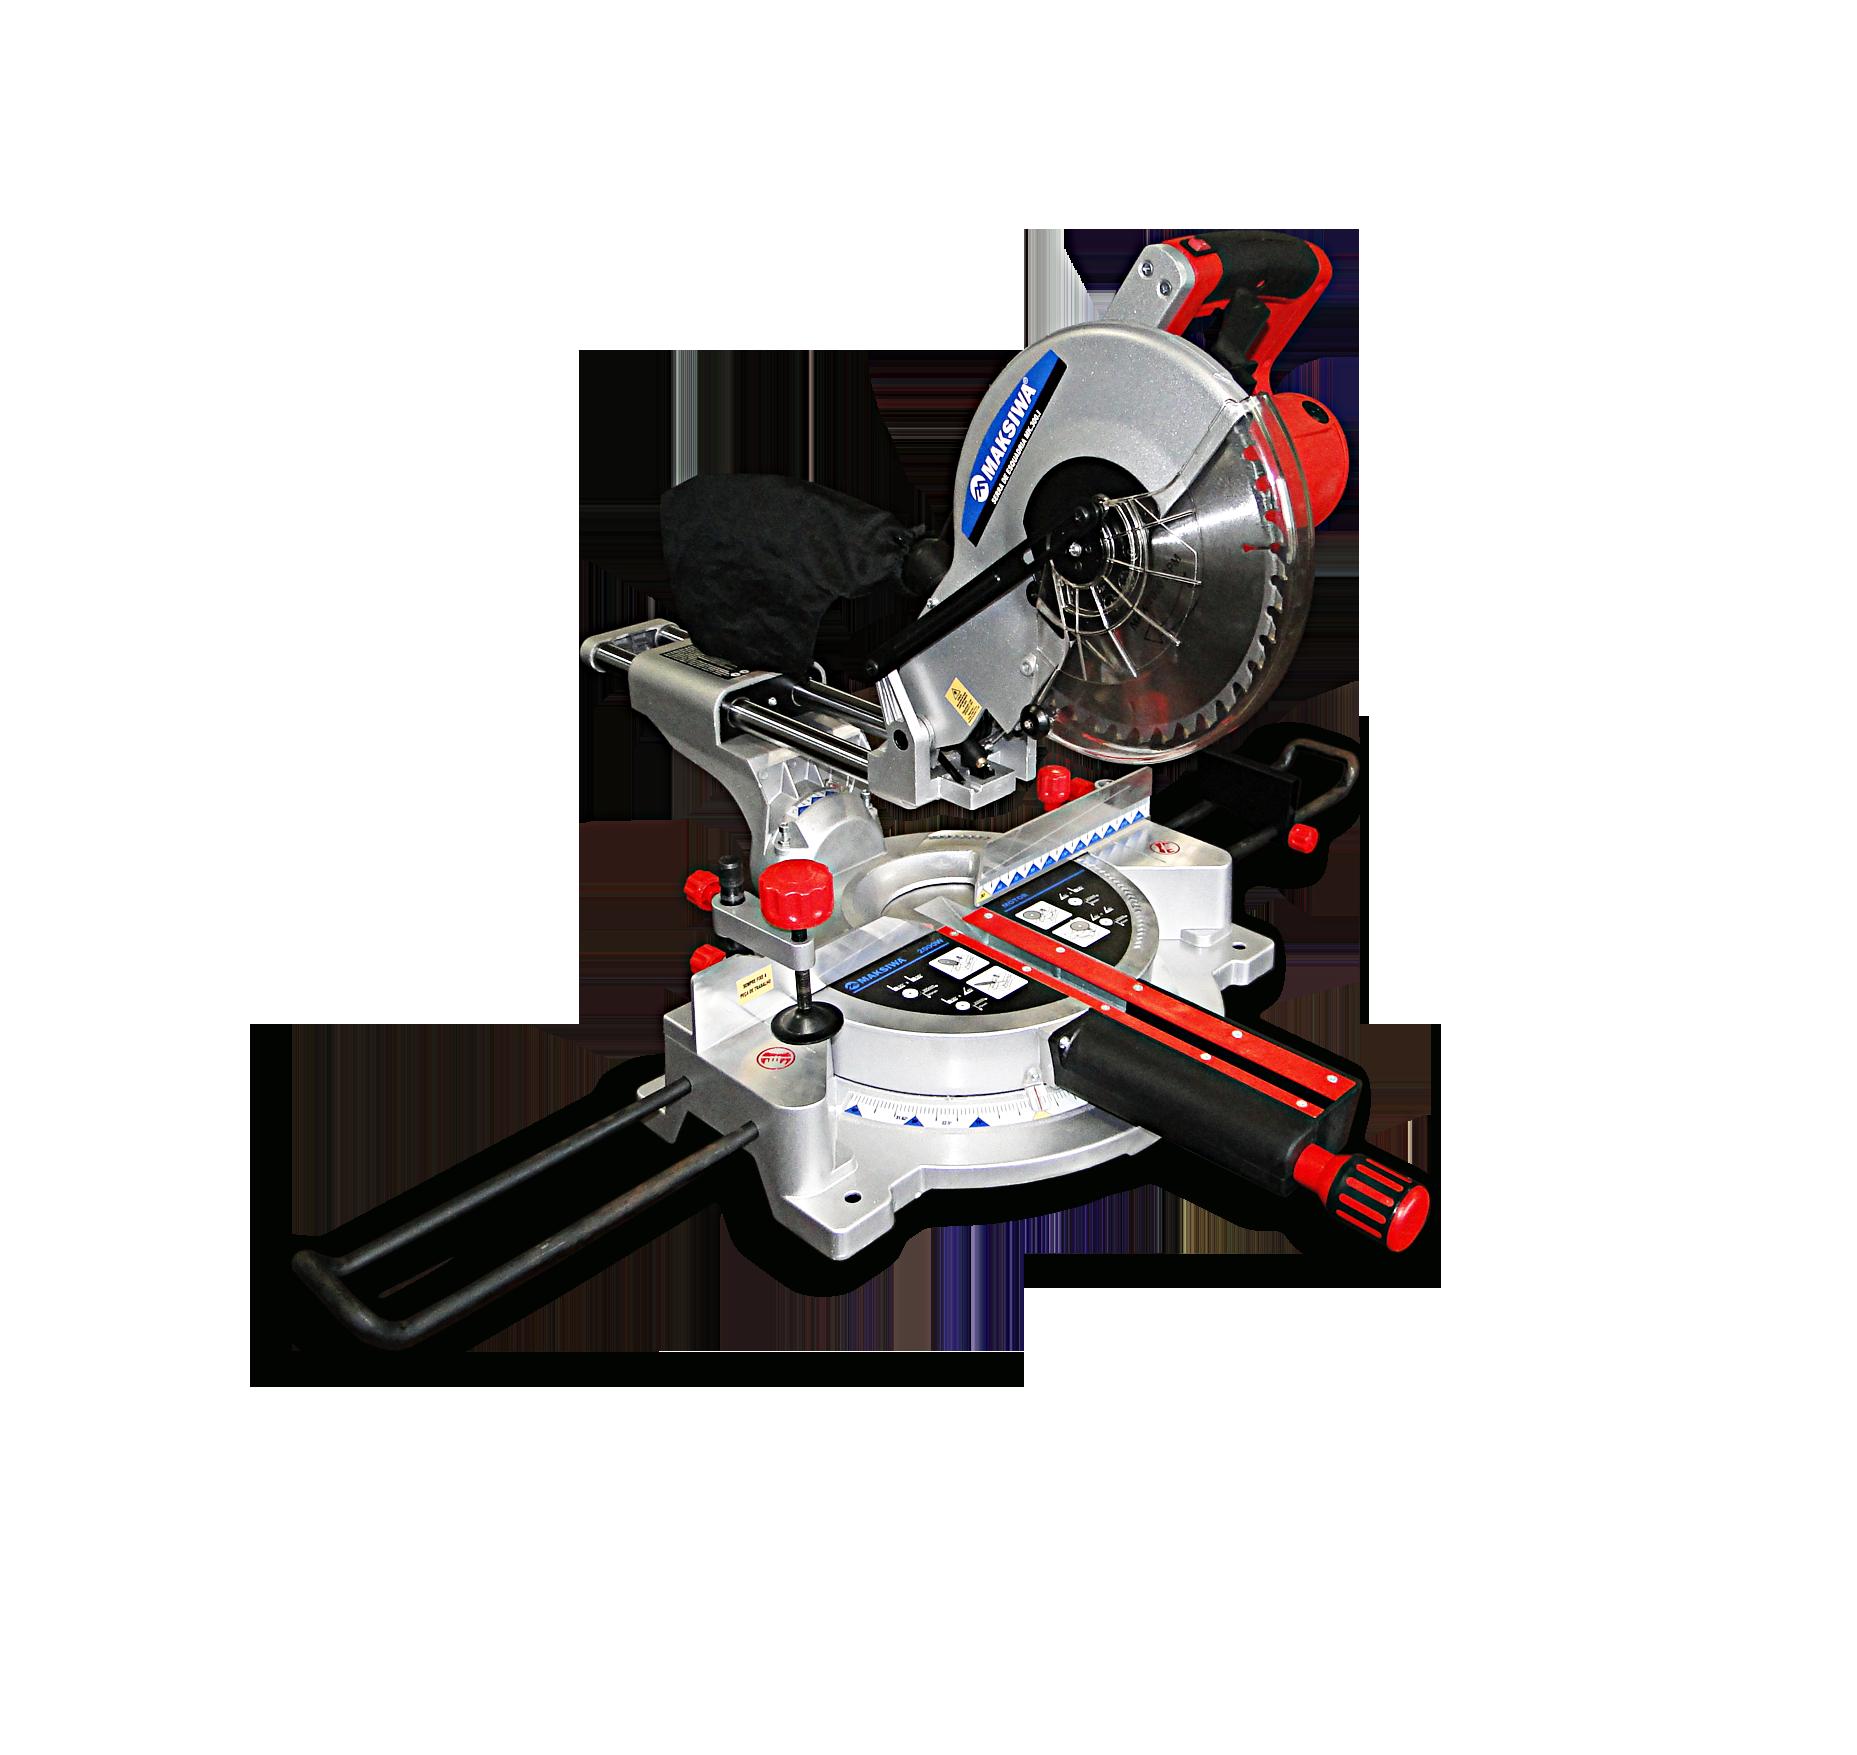 miter-saw-mk300i (2)